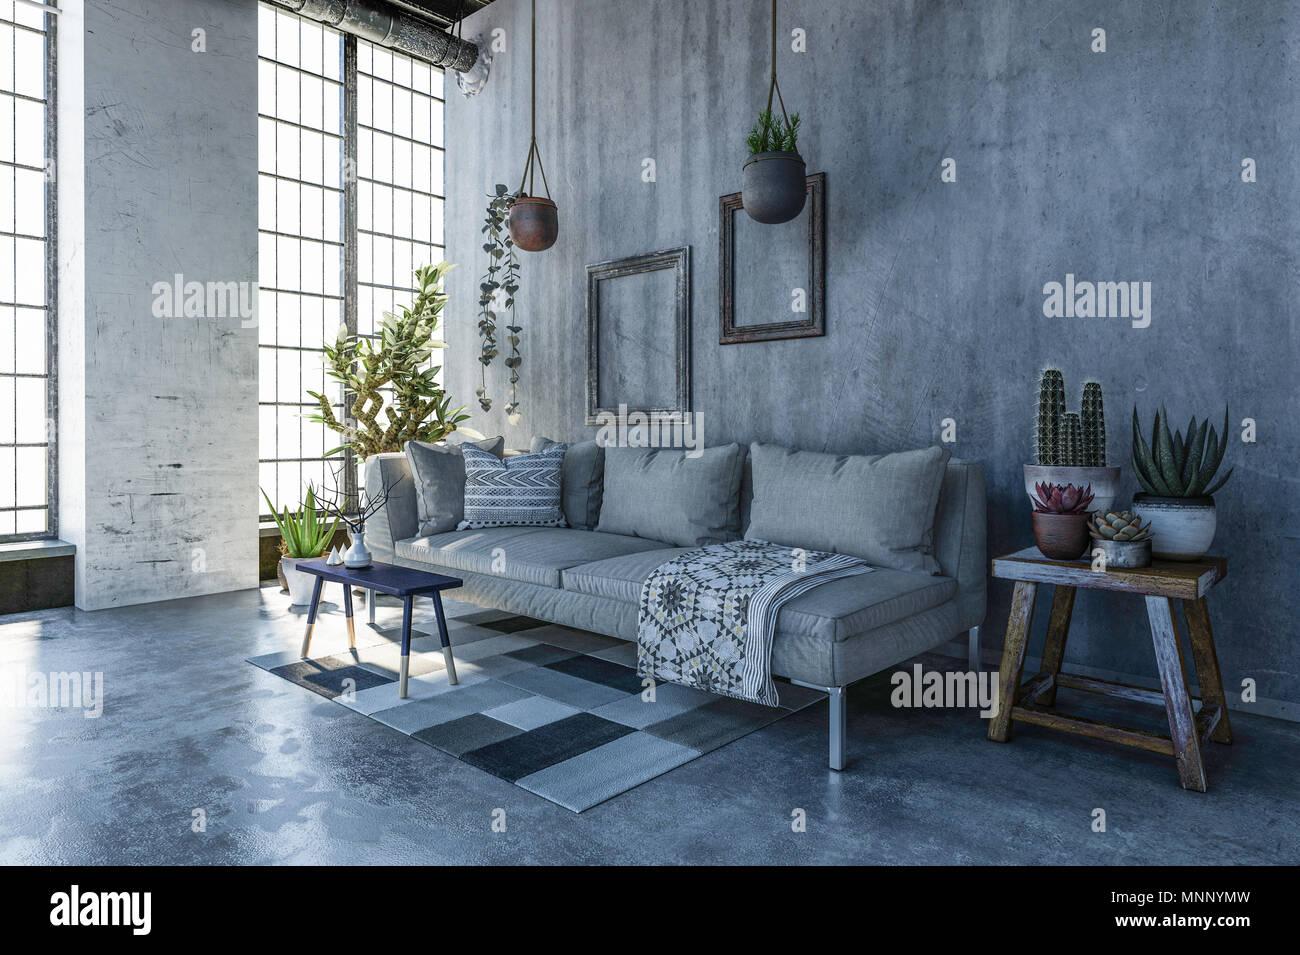 Cozy Corner In A Loft Conversion Living Room With Monochrome